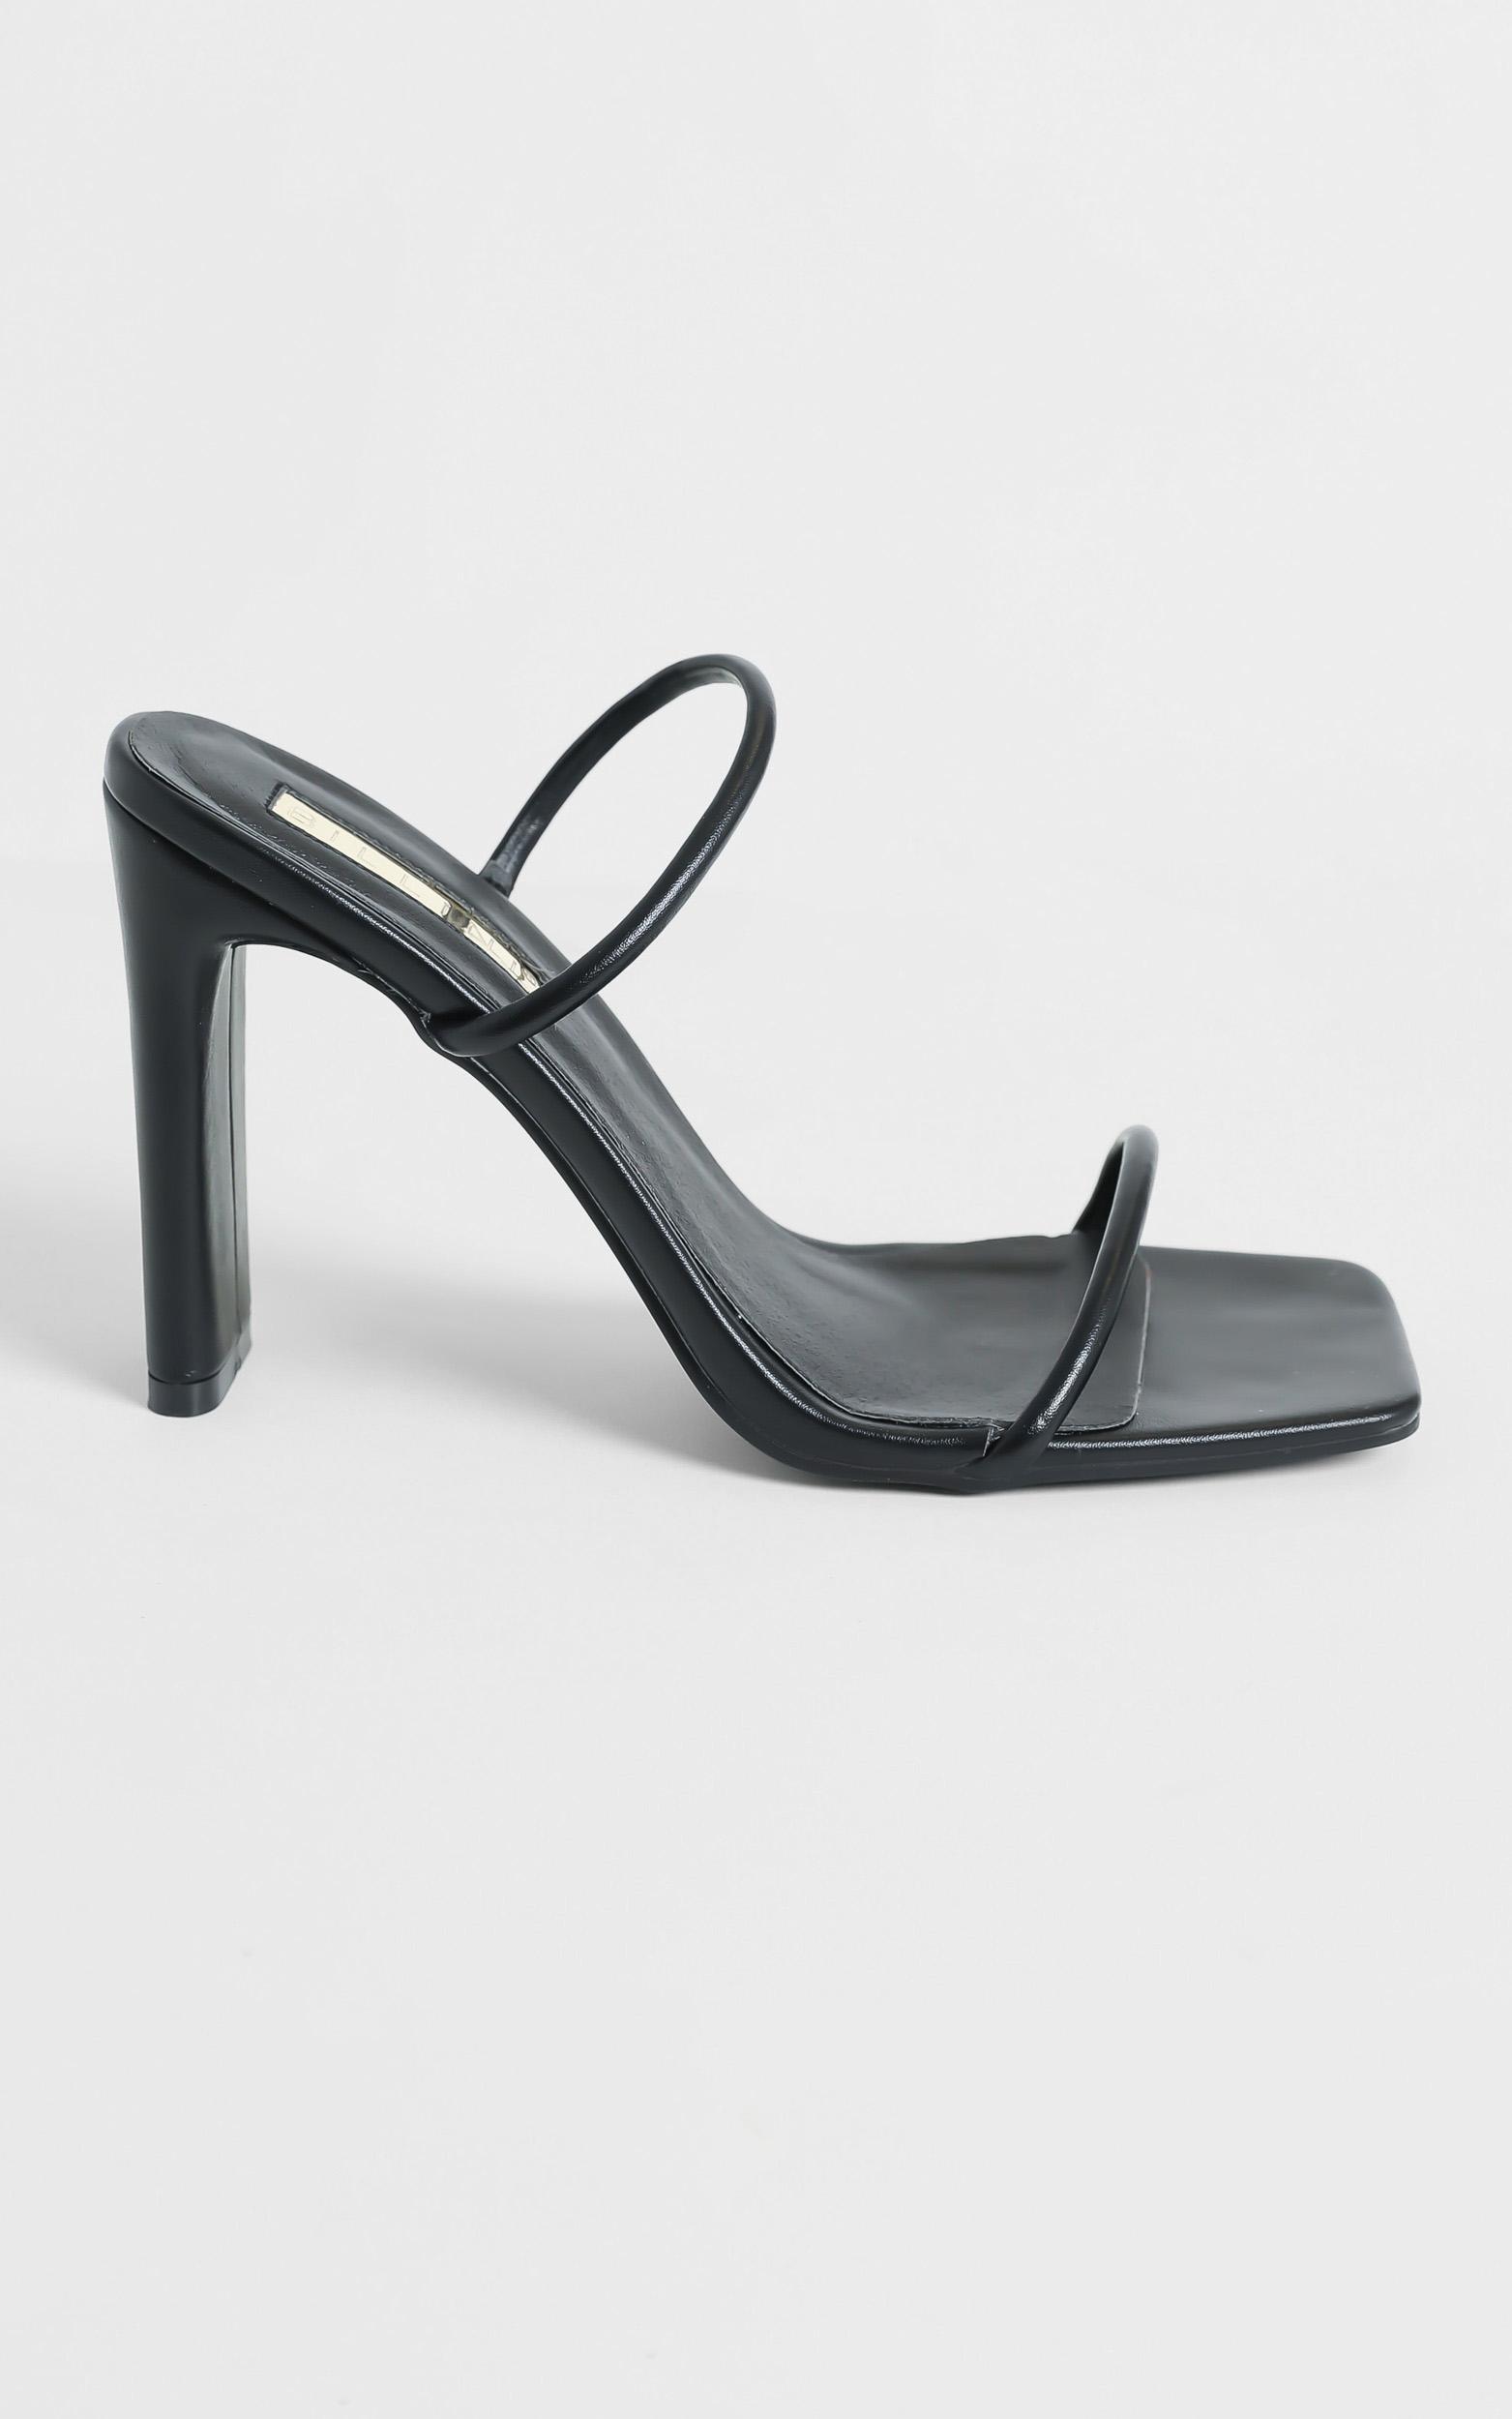 Billini - Chantel Heels in Black - 05, BLK1, hi-res image number null